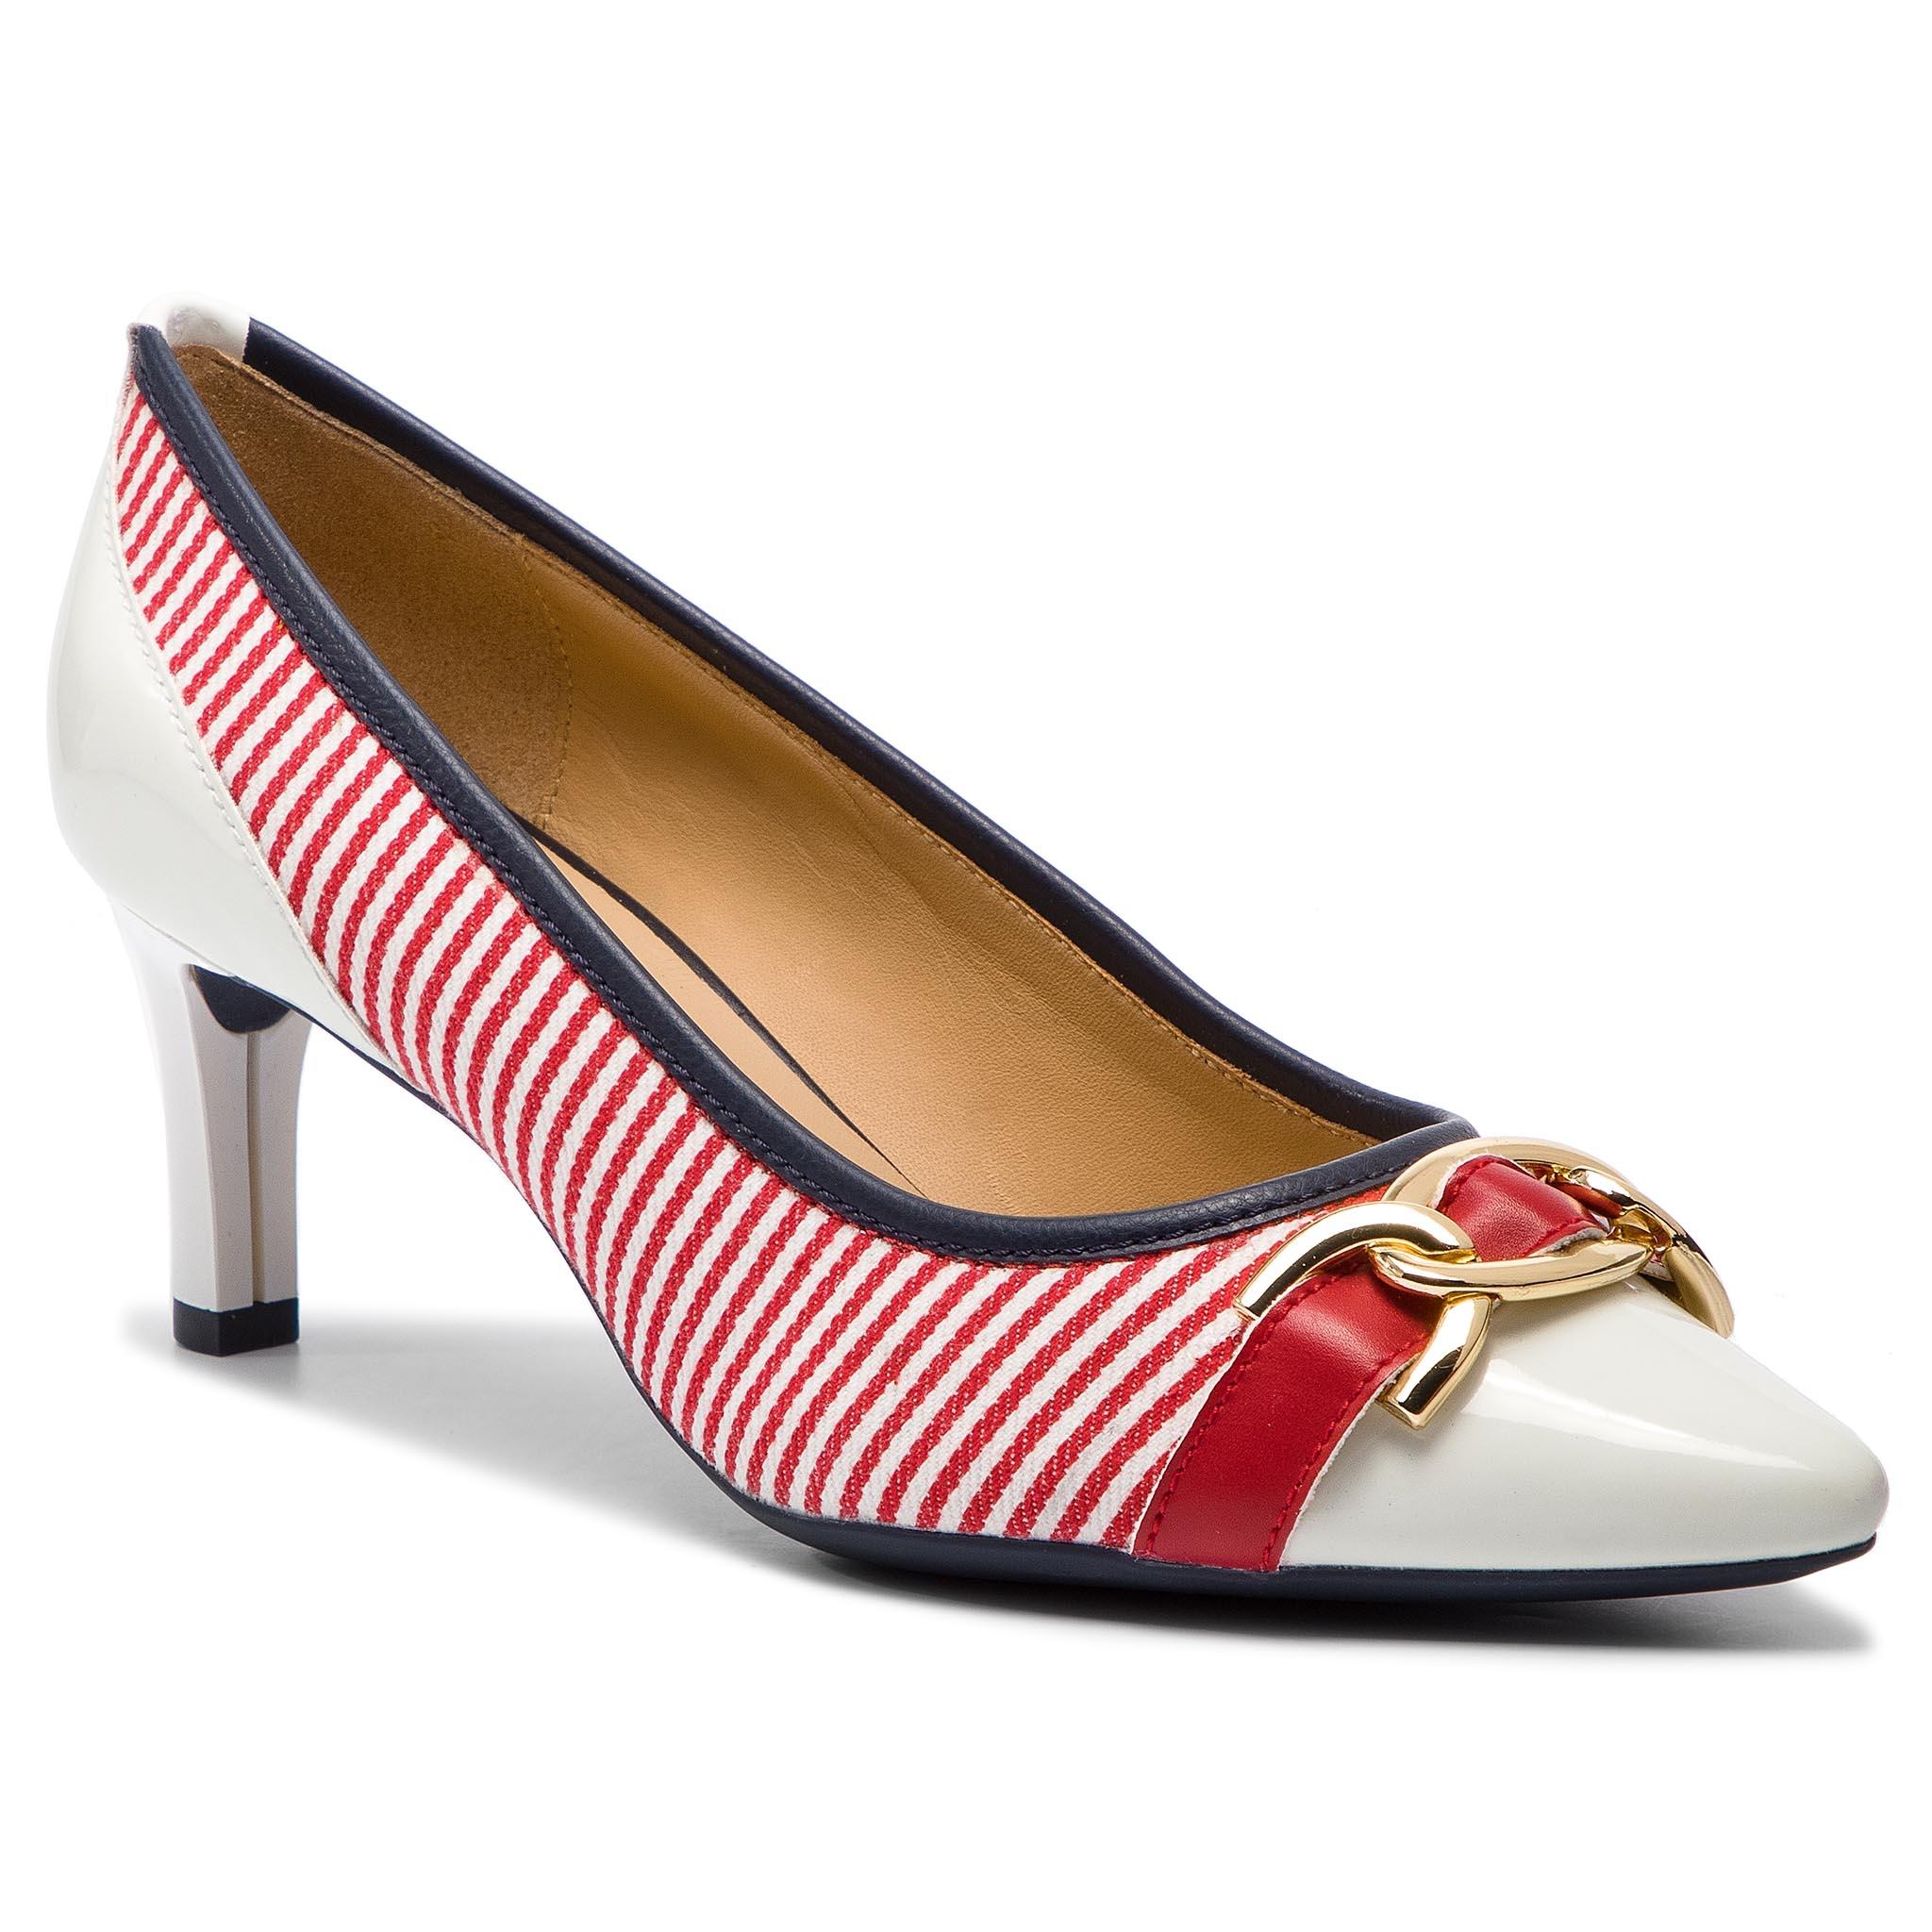 a7312b8420e Κλειστά παπούτσια GEOX - D Bibbiana D D829CD 0AWHH C0003 Red/White